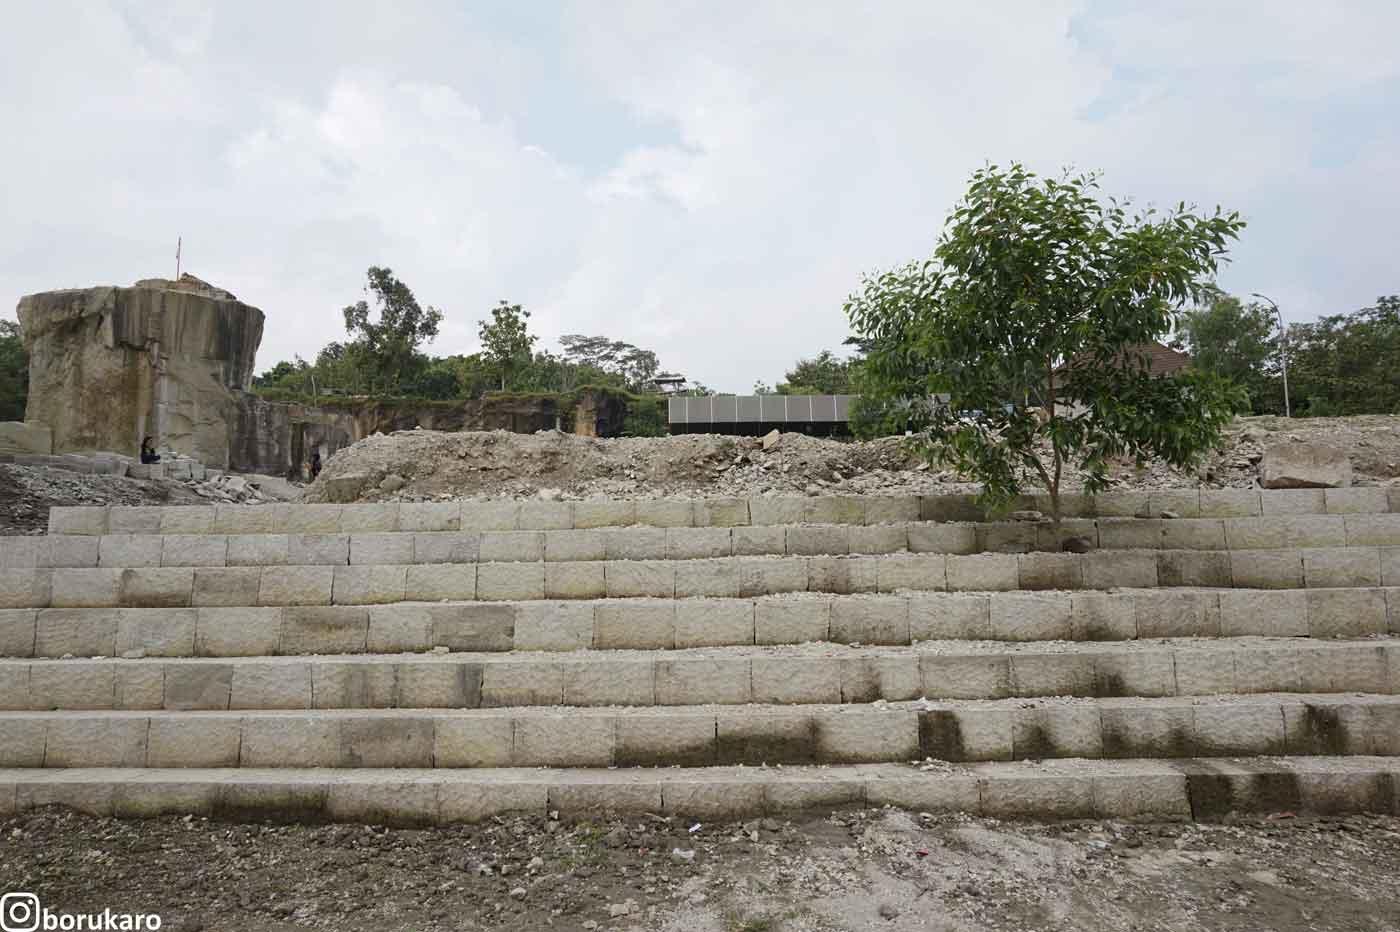 Tangga-tangga area Tebing Breksi